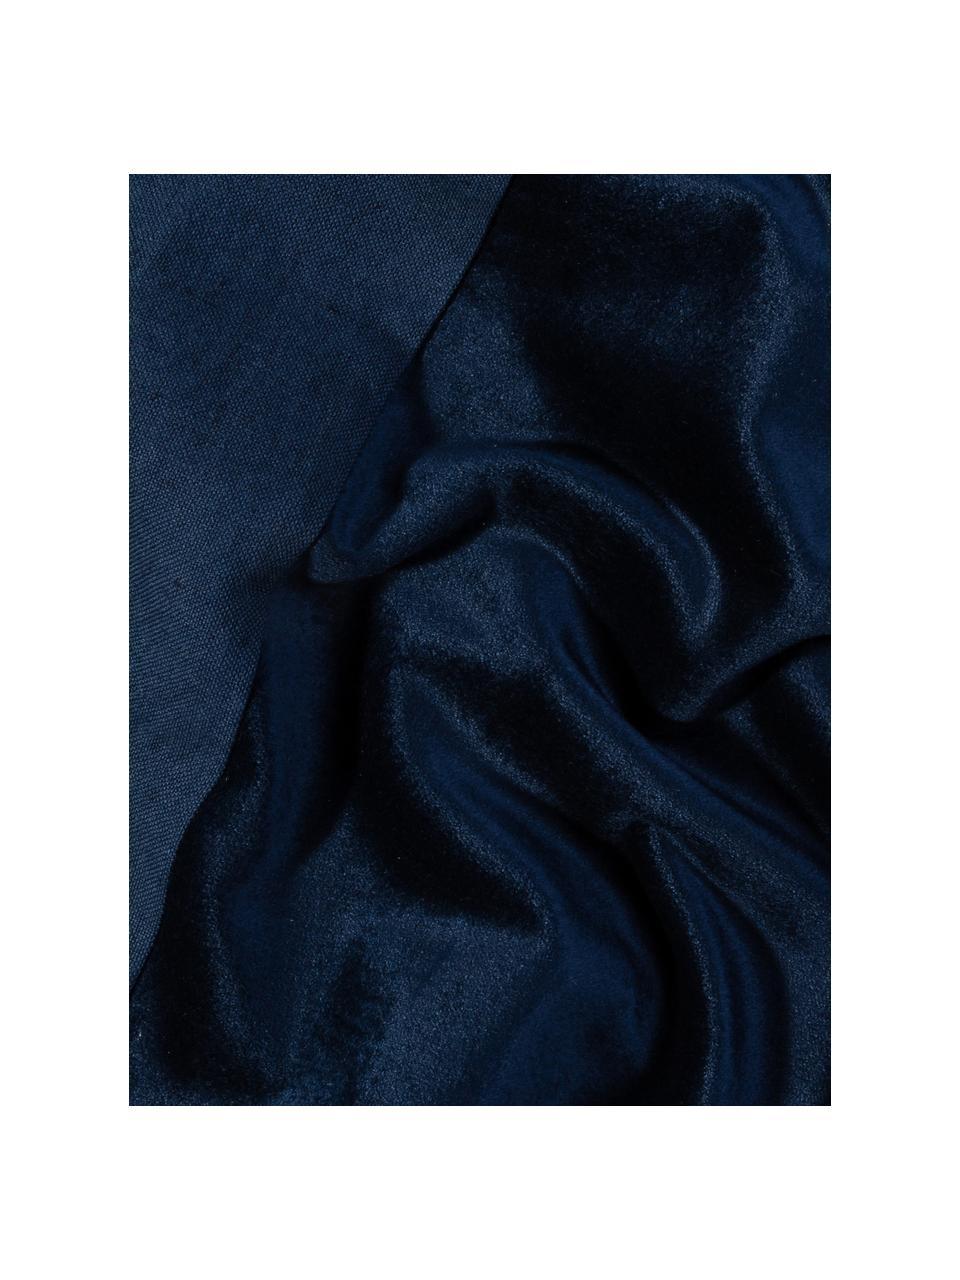 Kissenhülle Adelaide aus Samt/Leinen in Dunkelblau, Dunkelblau, 40 x 40 cm